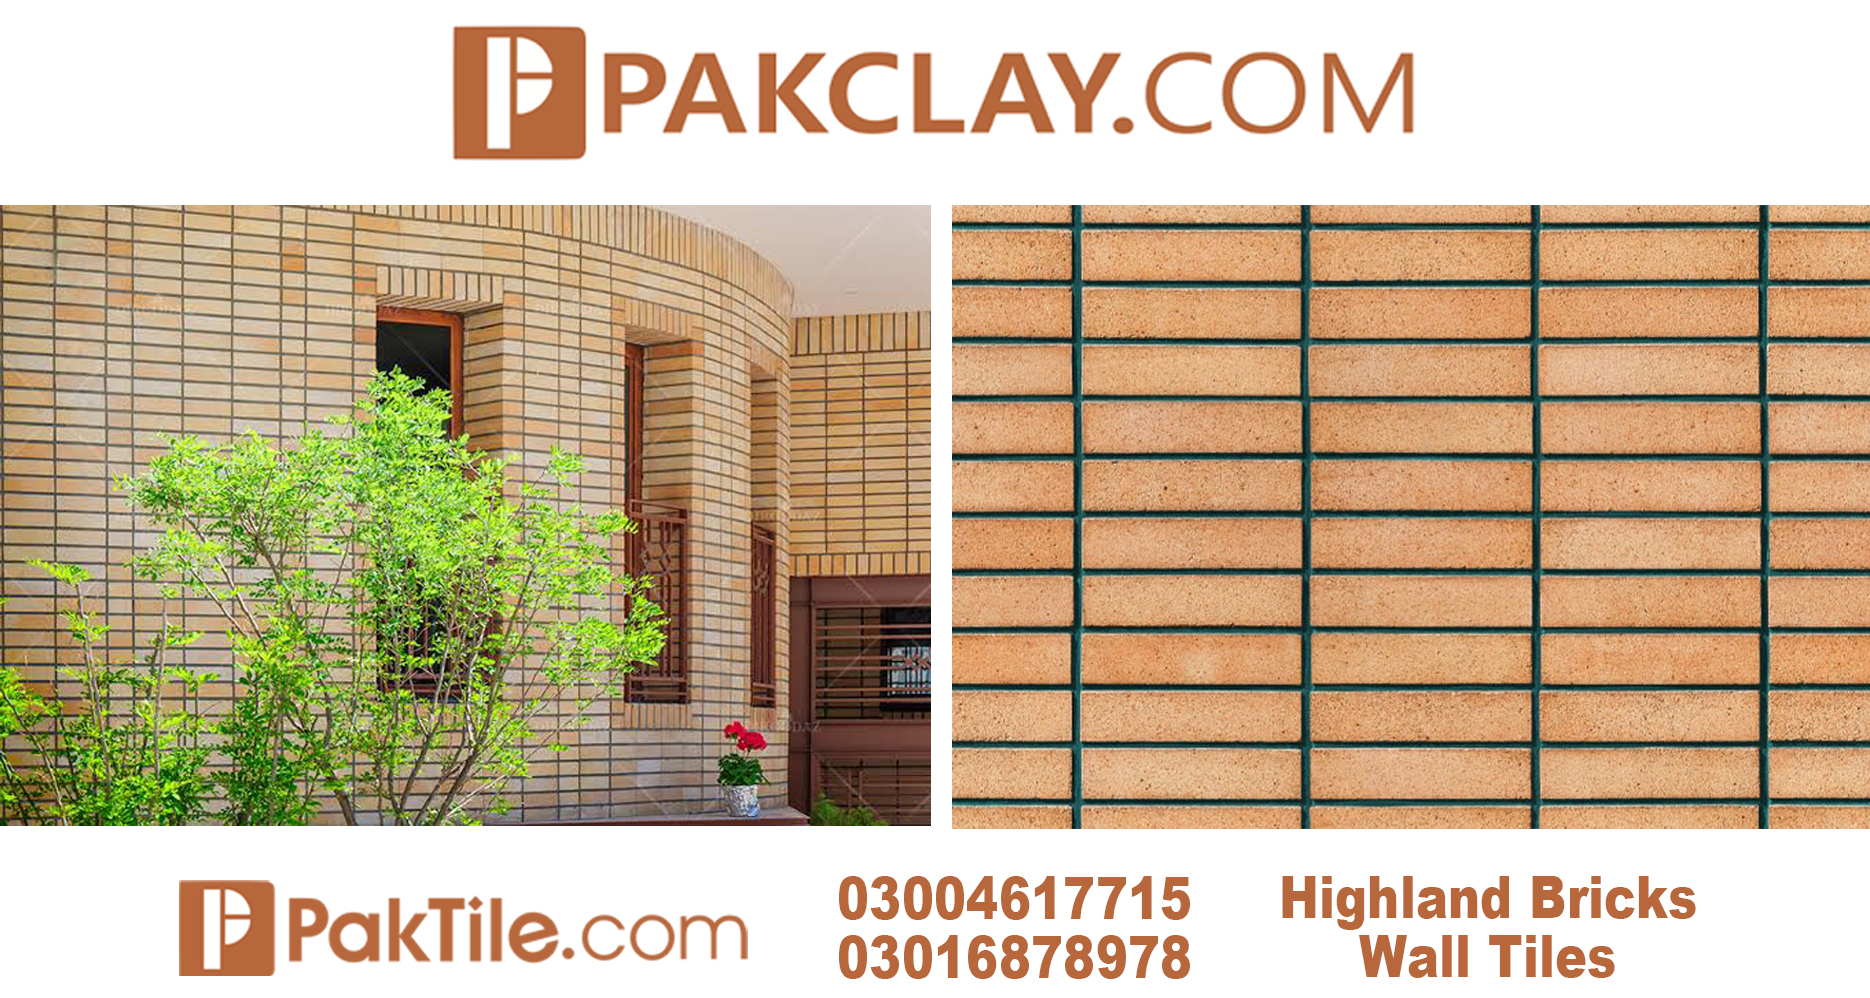 09 Highland Brick wall tiles in pakistan